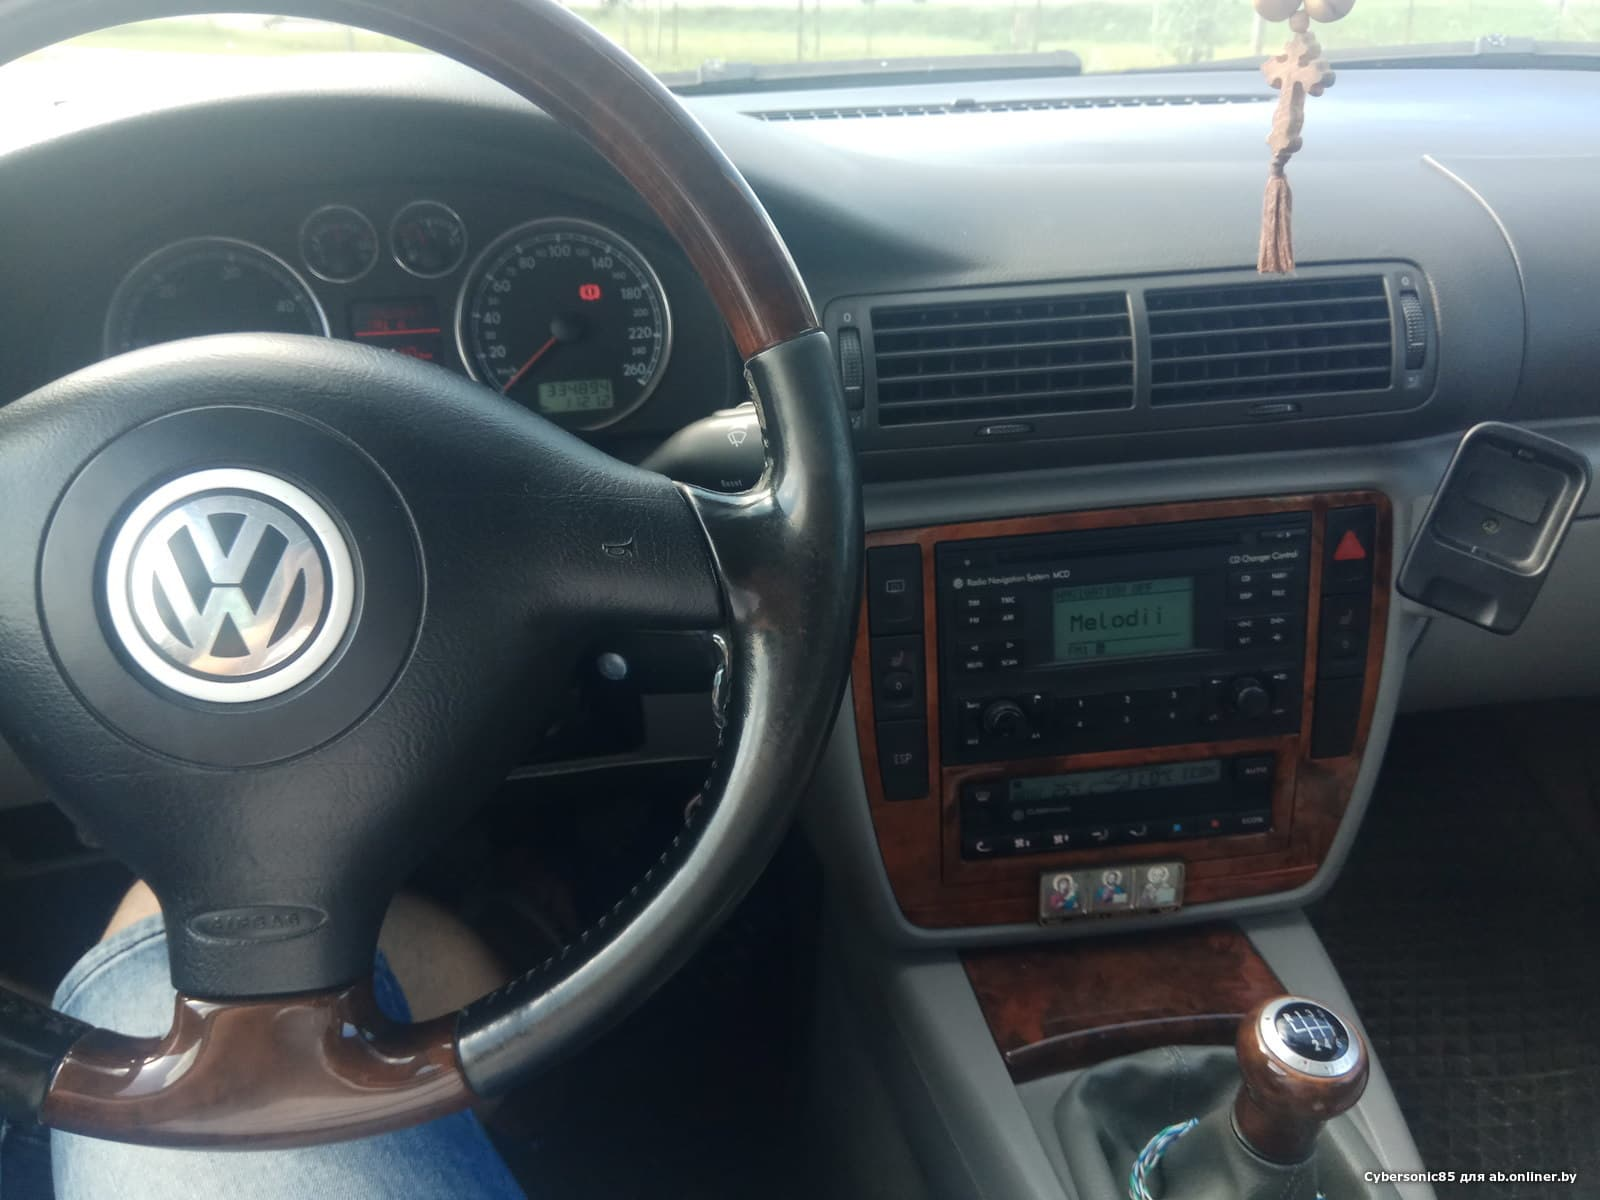 Volkswagen Passat B5 GP Highline 4 motion